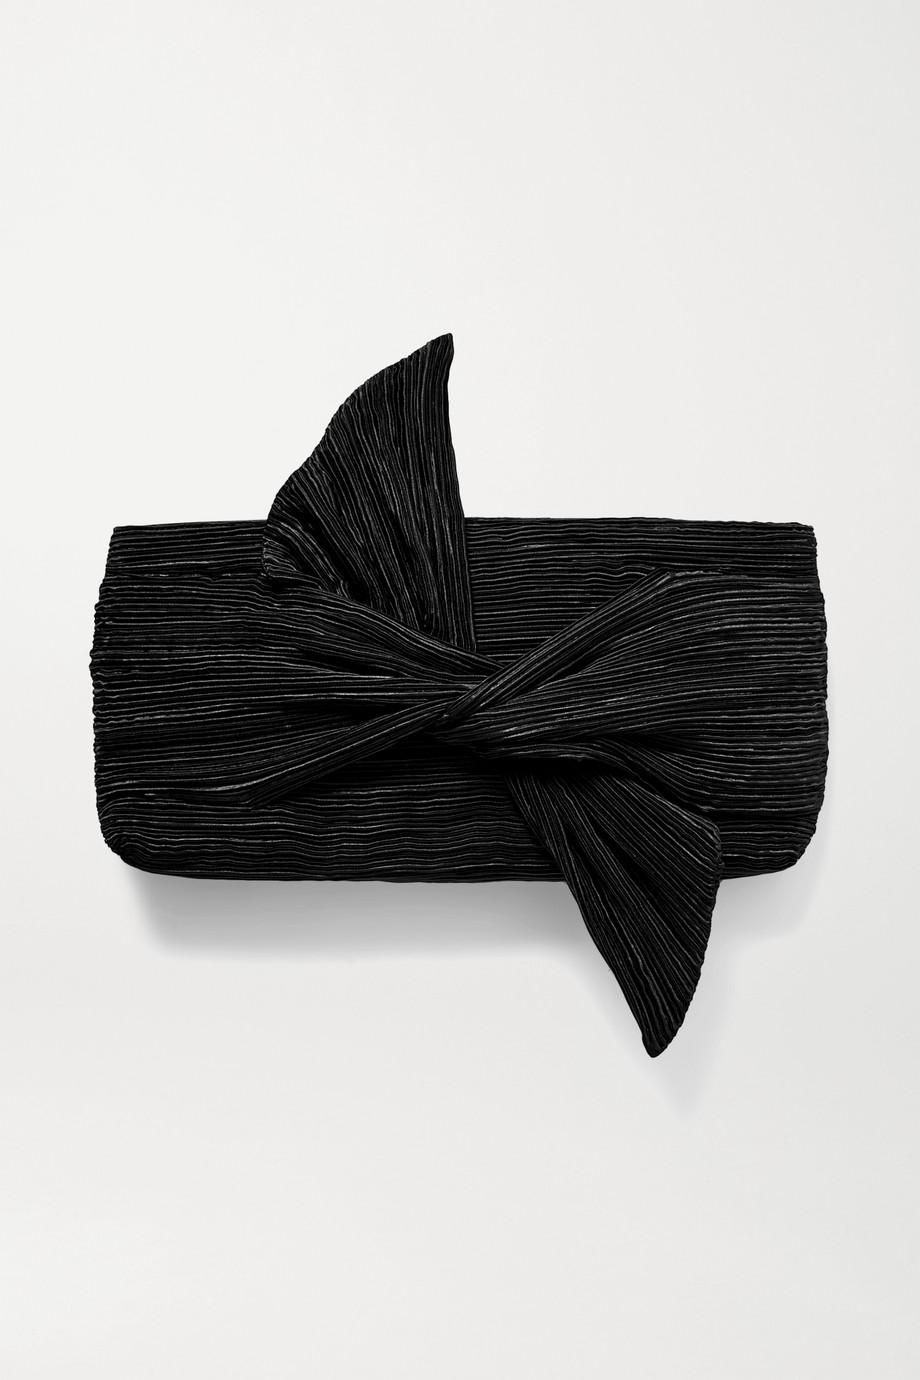 Cult Gaia Banu bow-embellished plissé-satin clutch